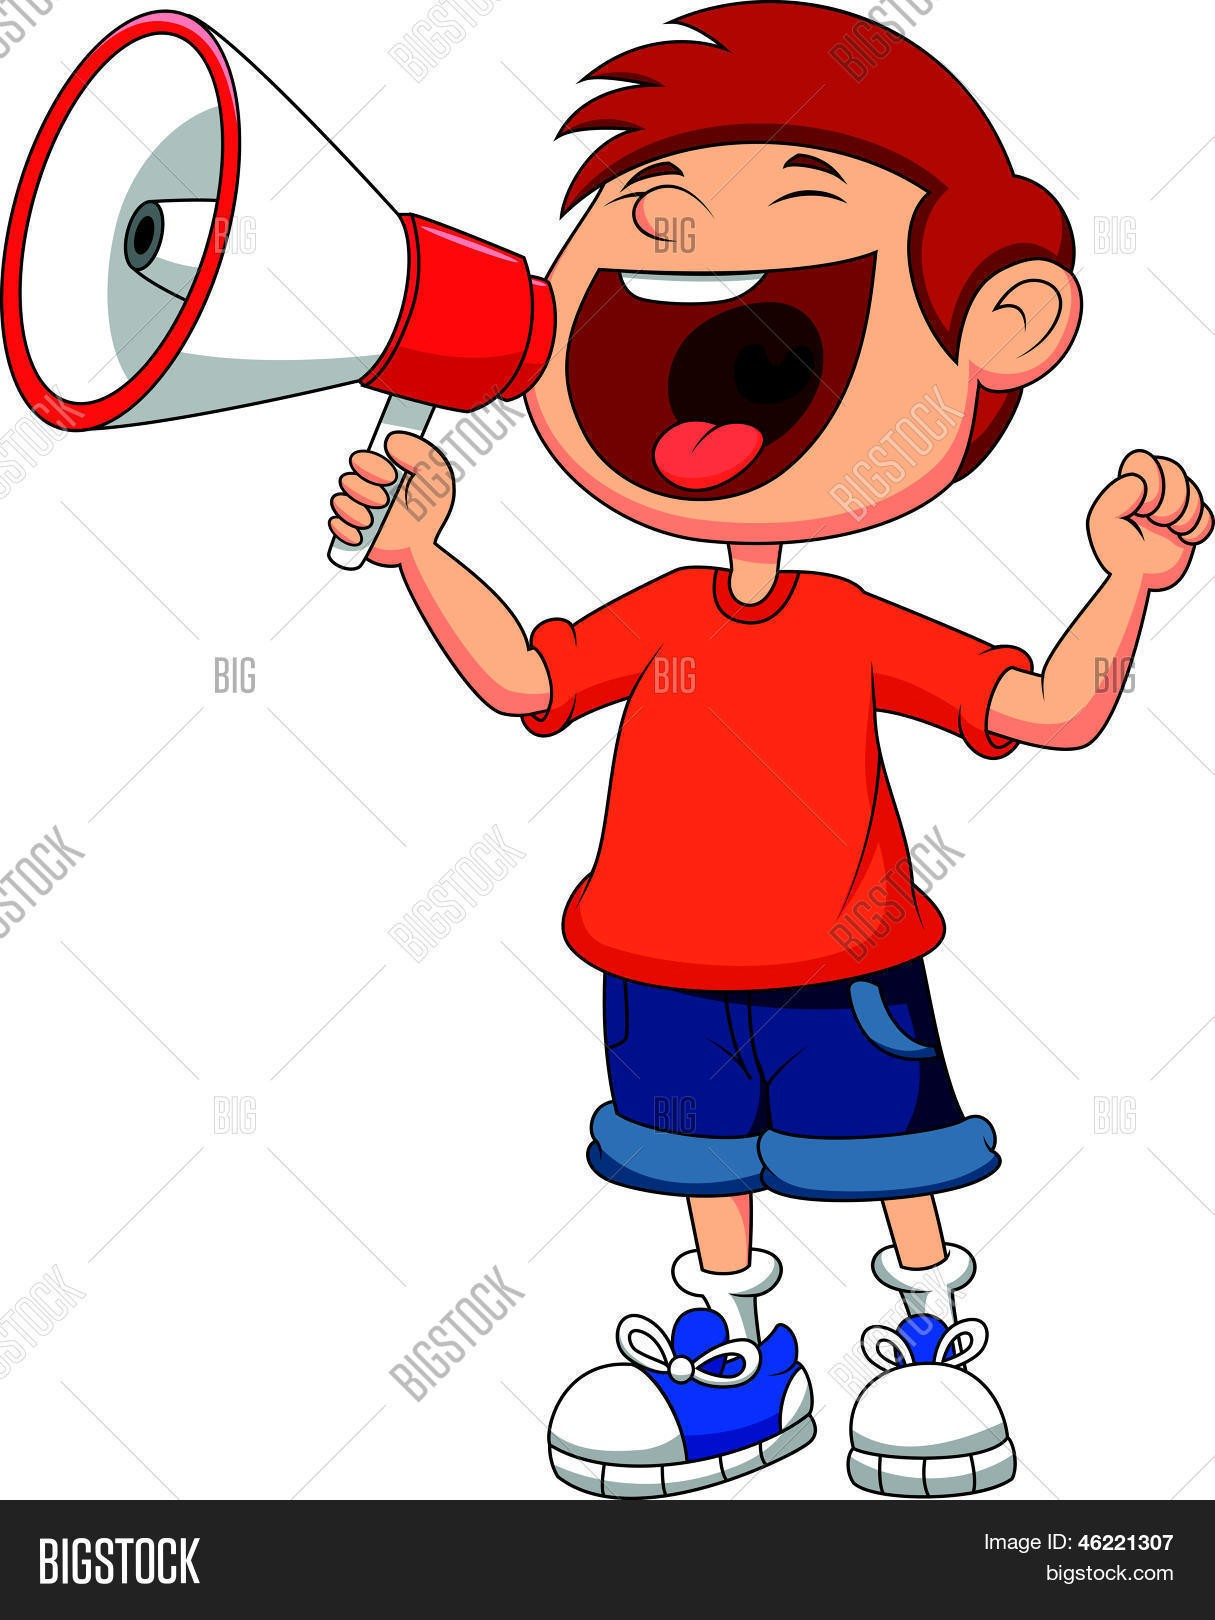 1215x1620 Cartoon Boy Images Free Best Cartoon Boy Yelling Vector Amp Free